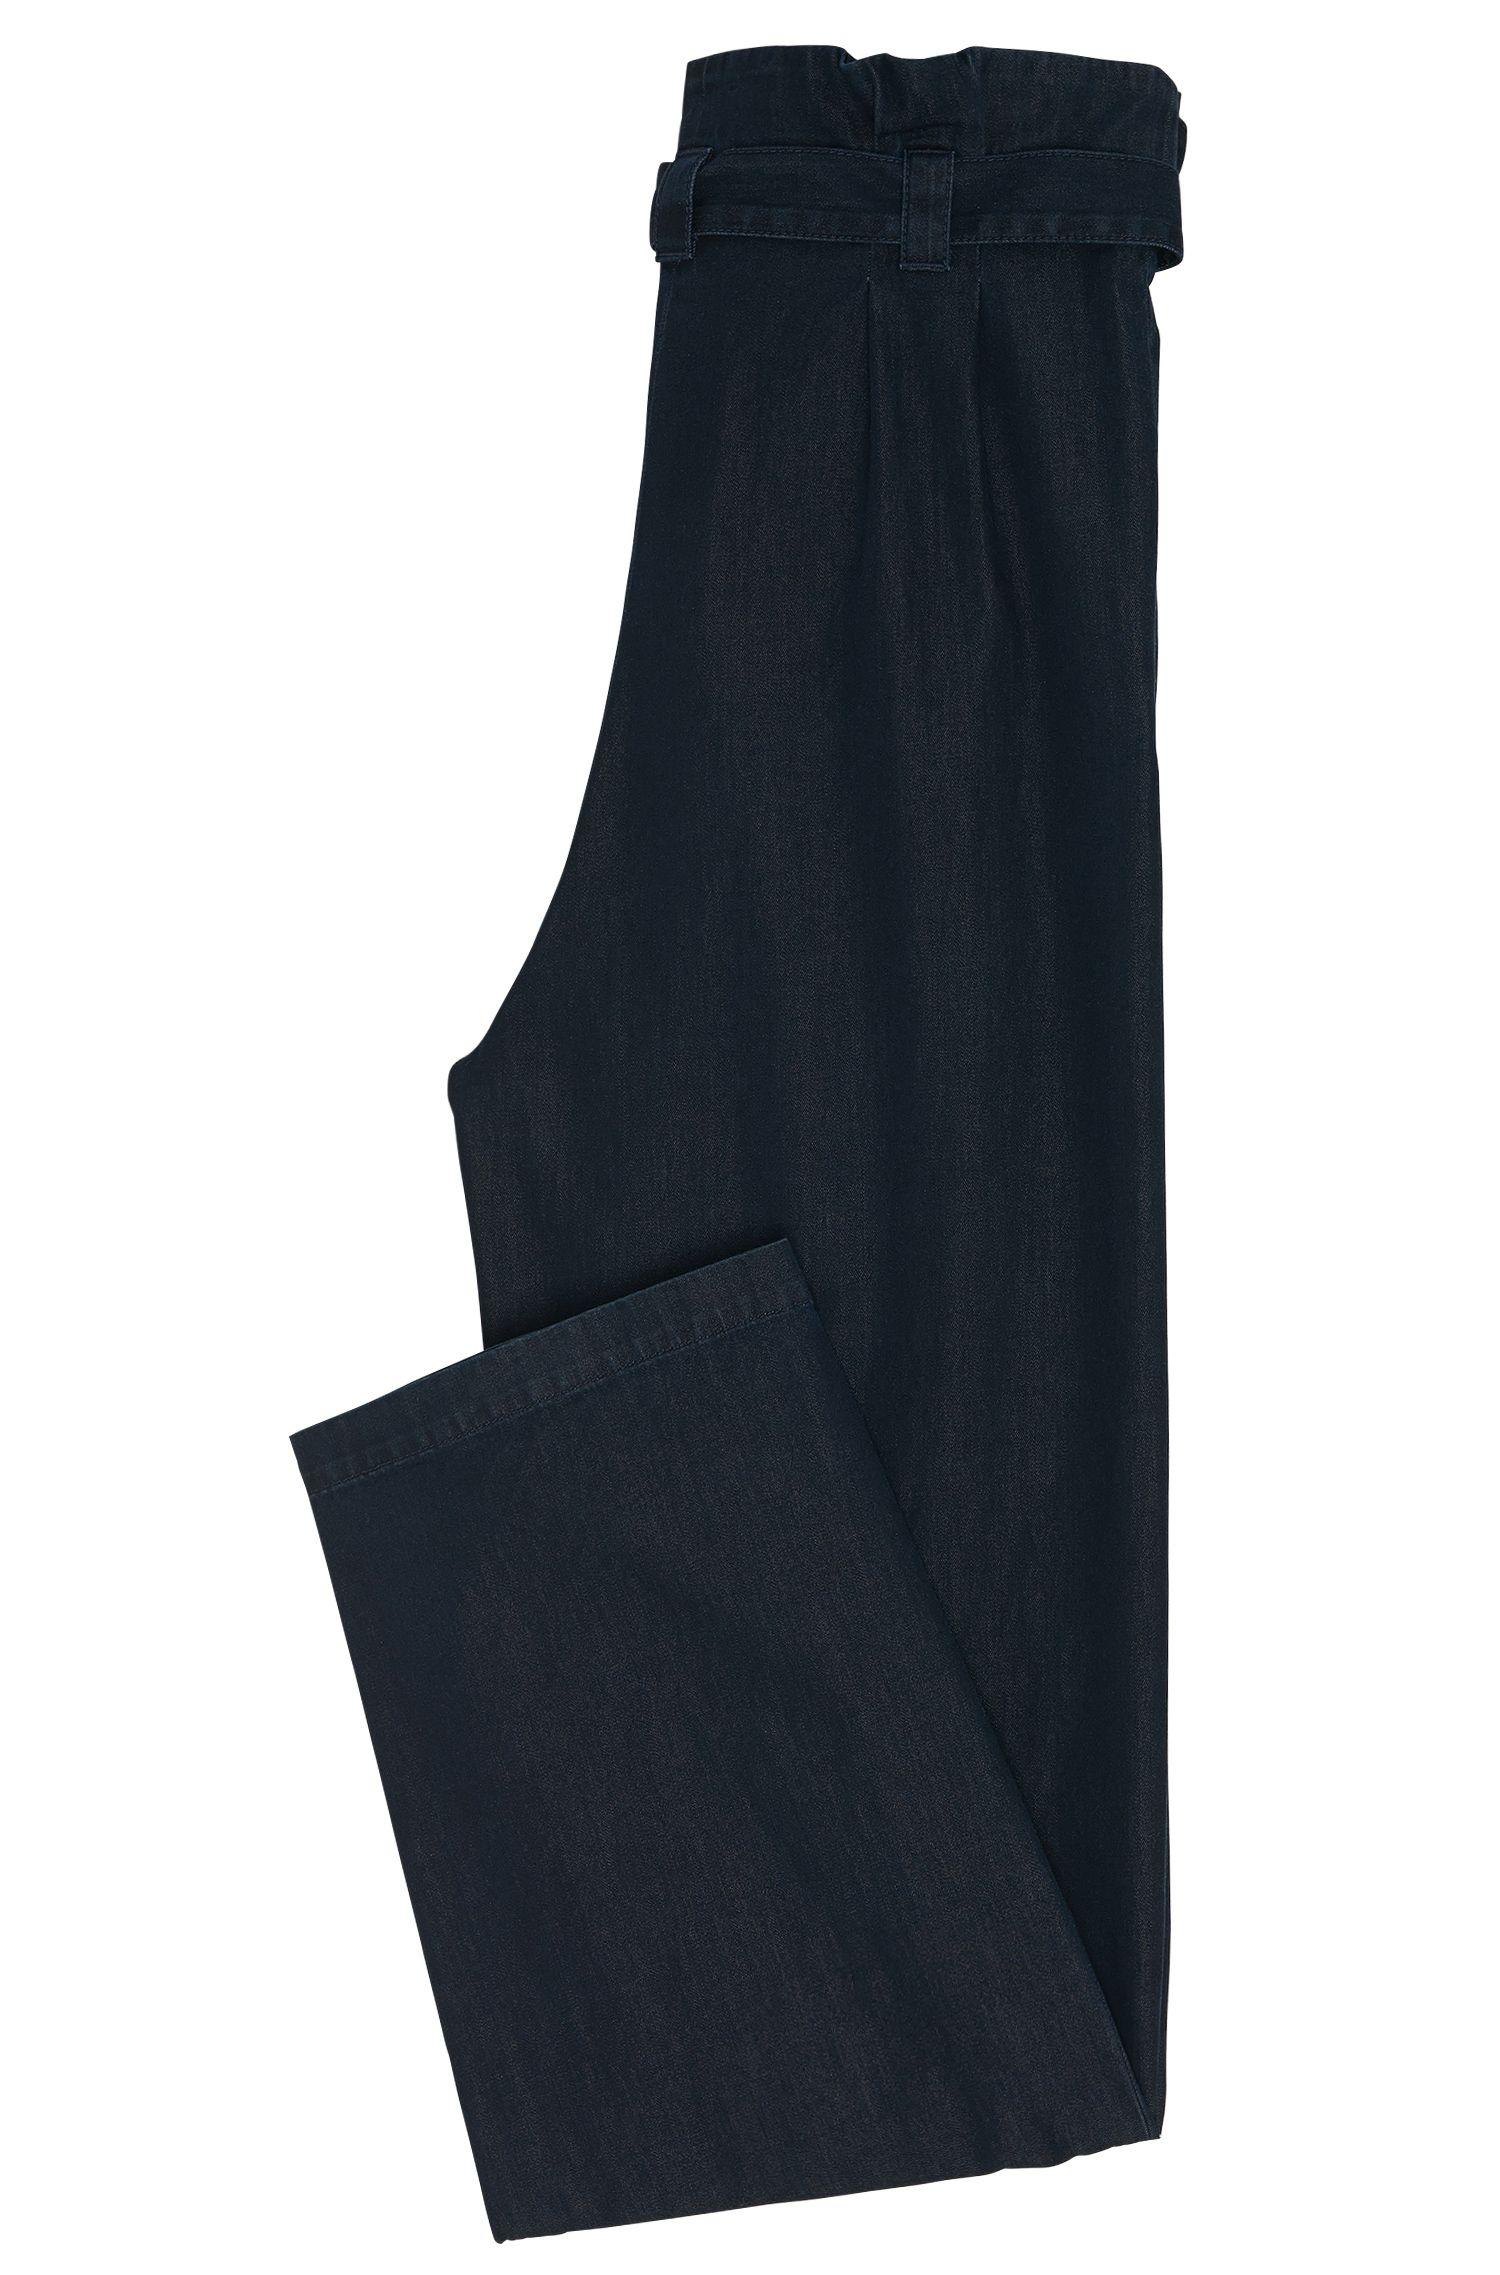 High Waisted Hose aus Baumwolle in Denim-Optik: 'Hifes-W'